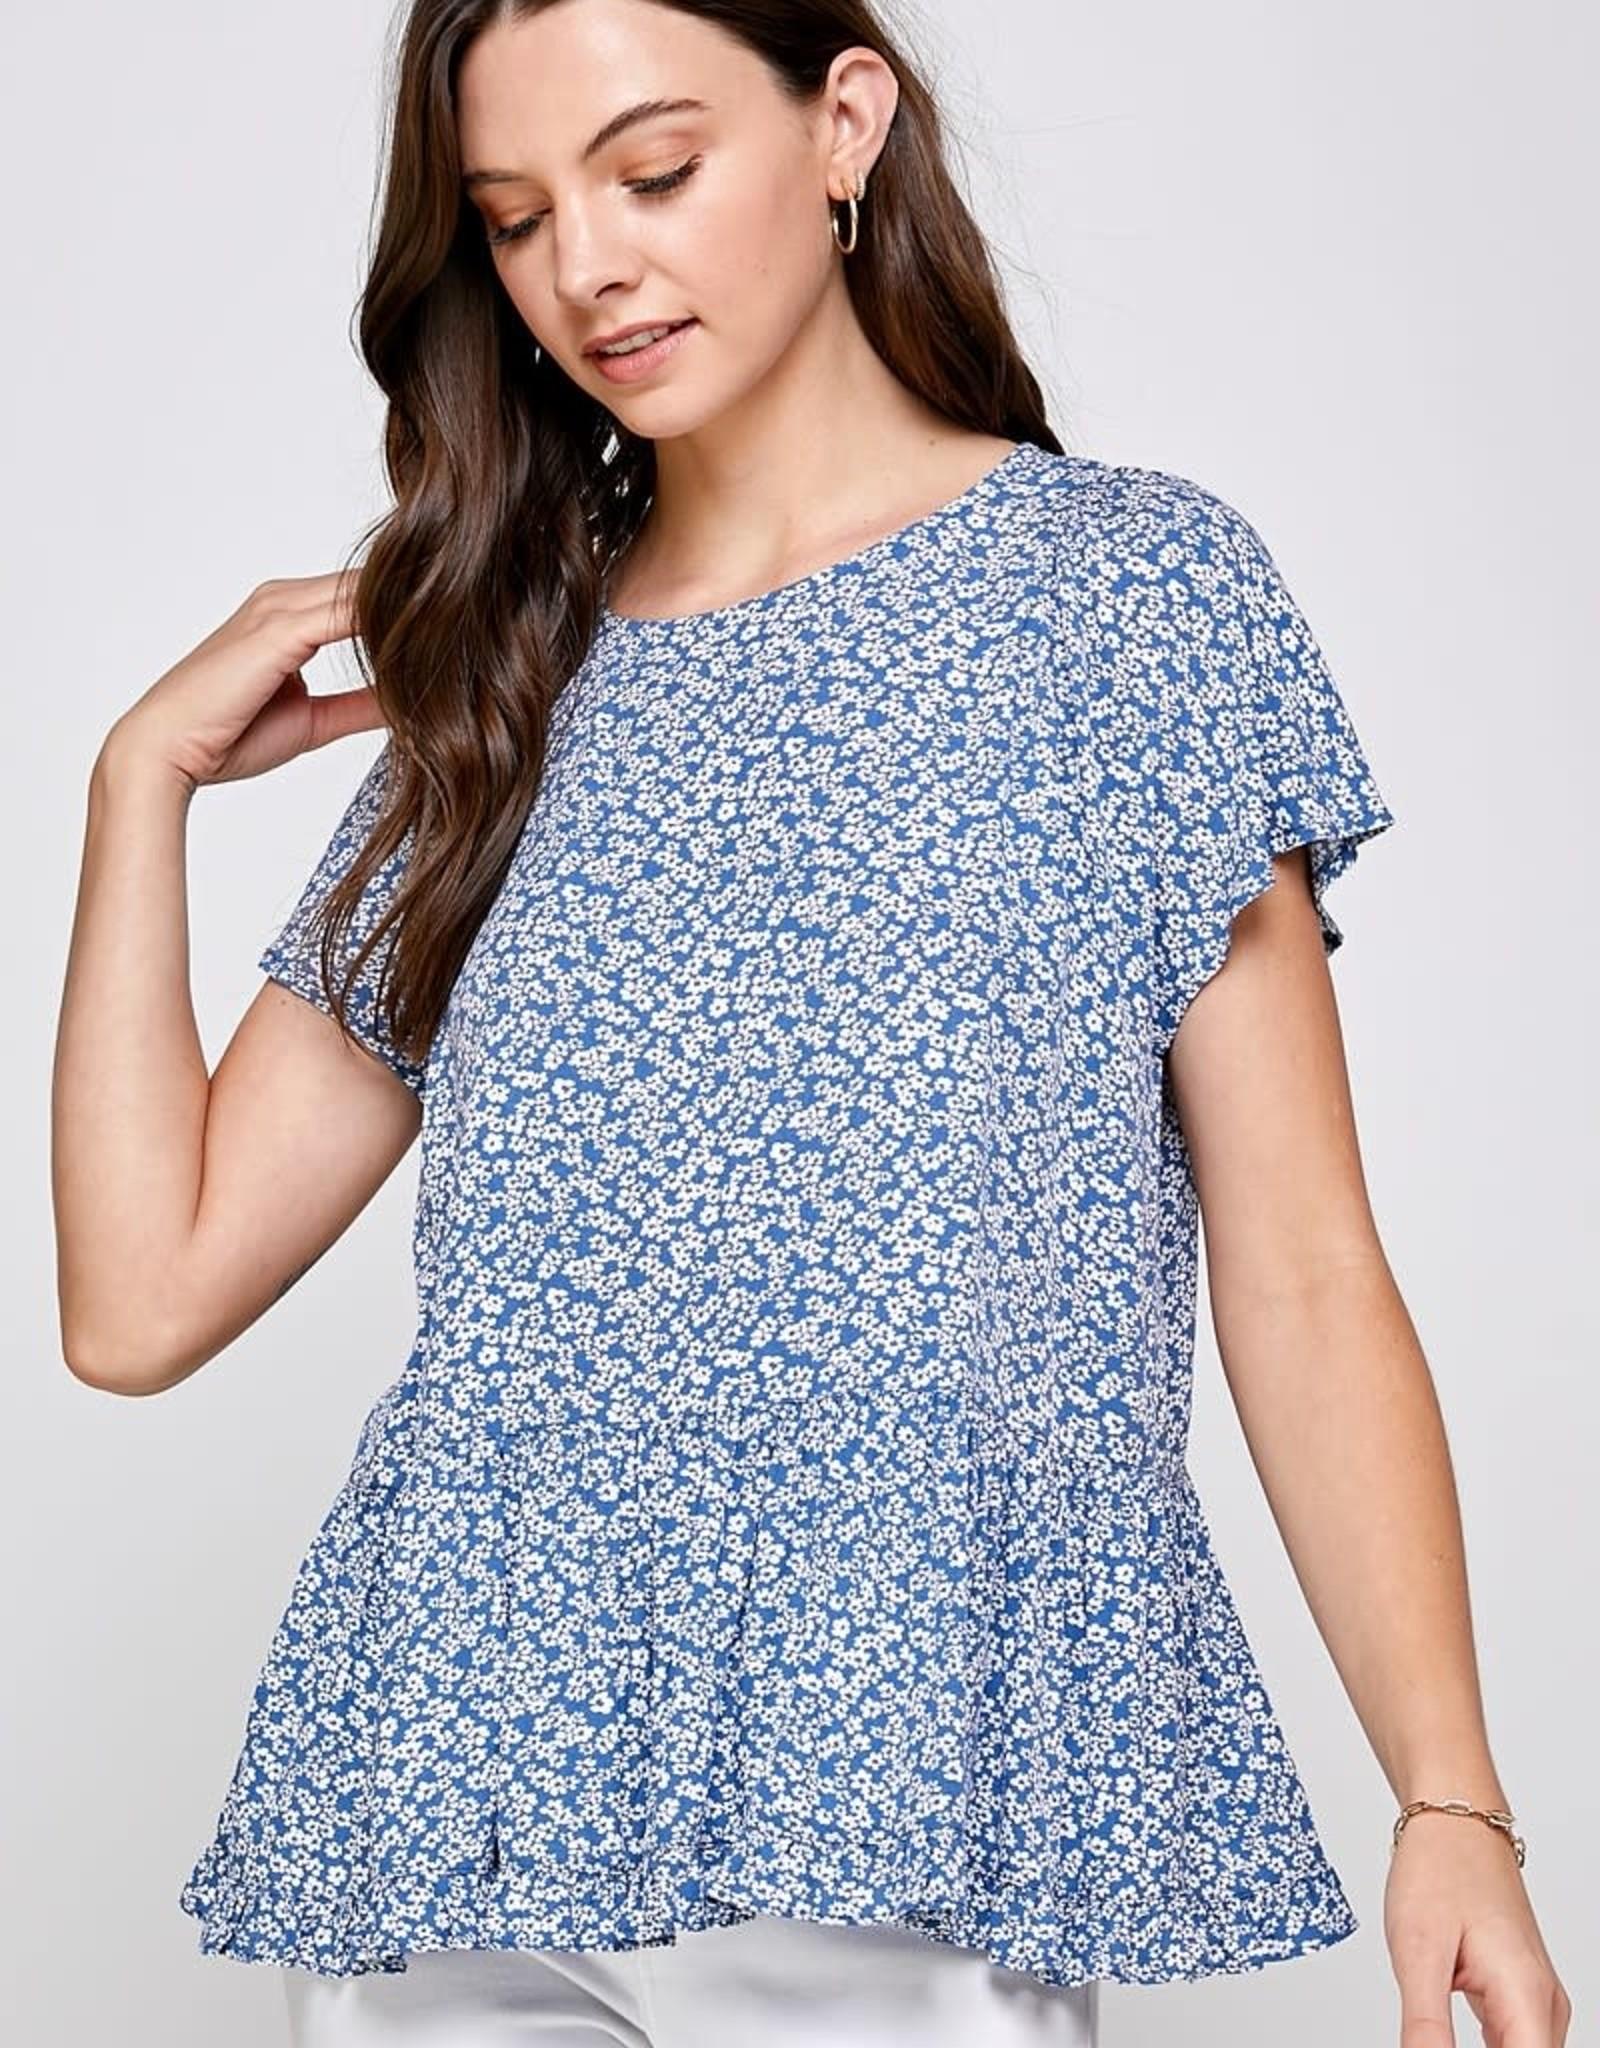 Miss Bliss Ditsy Print Drop Shoulder Slv Top-Blue